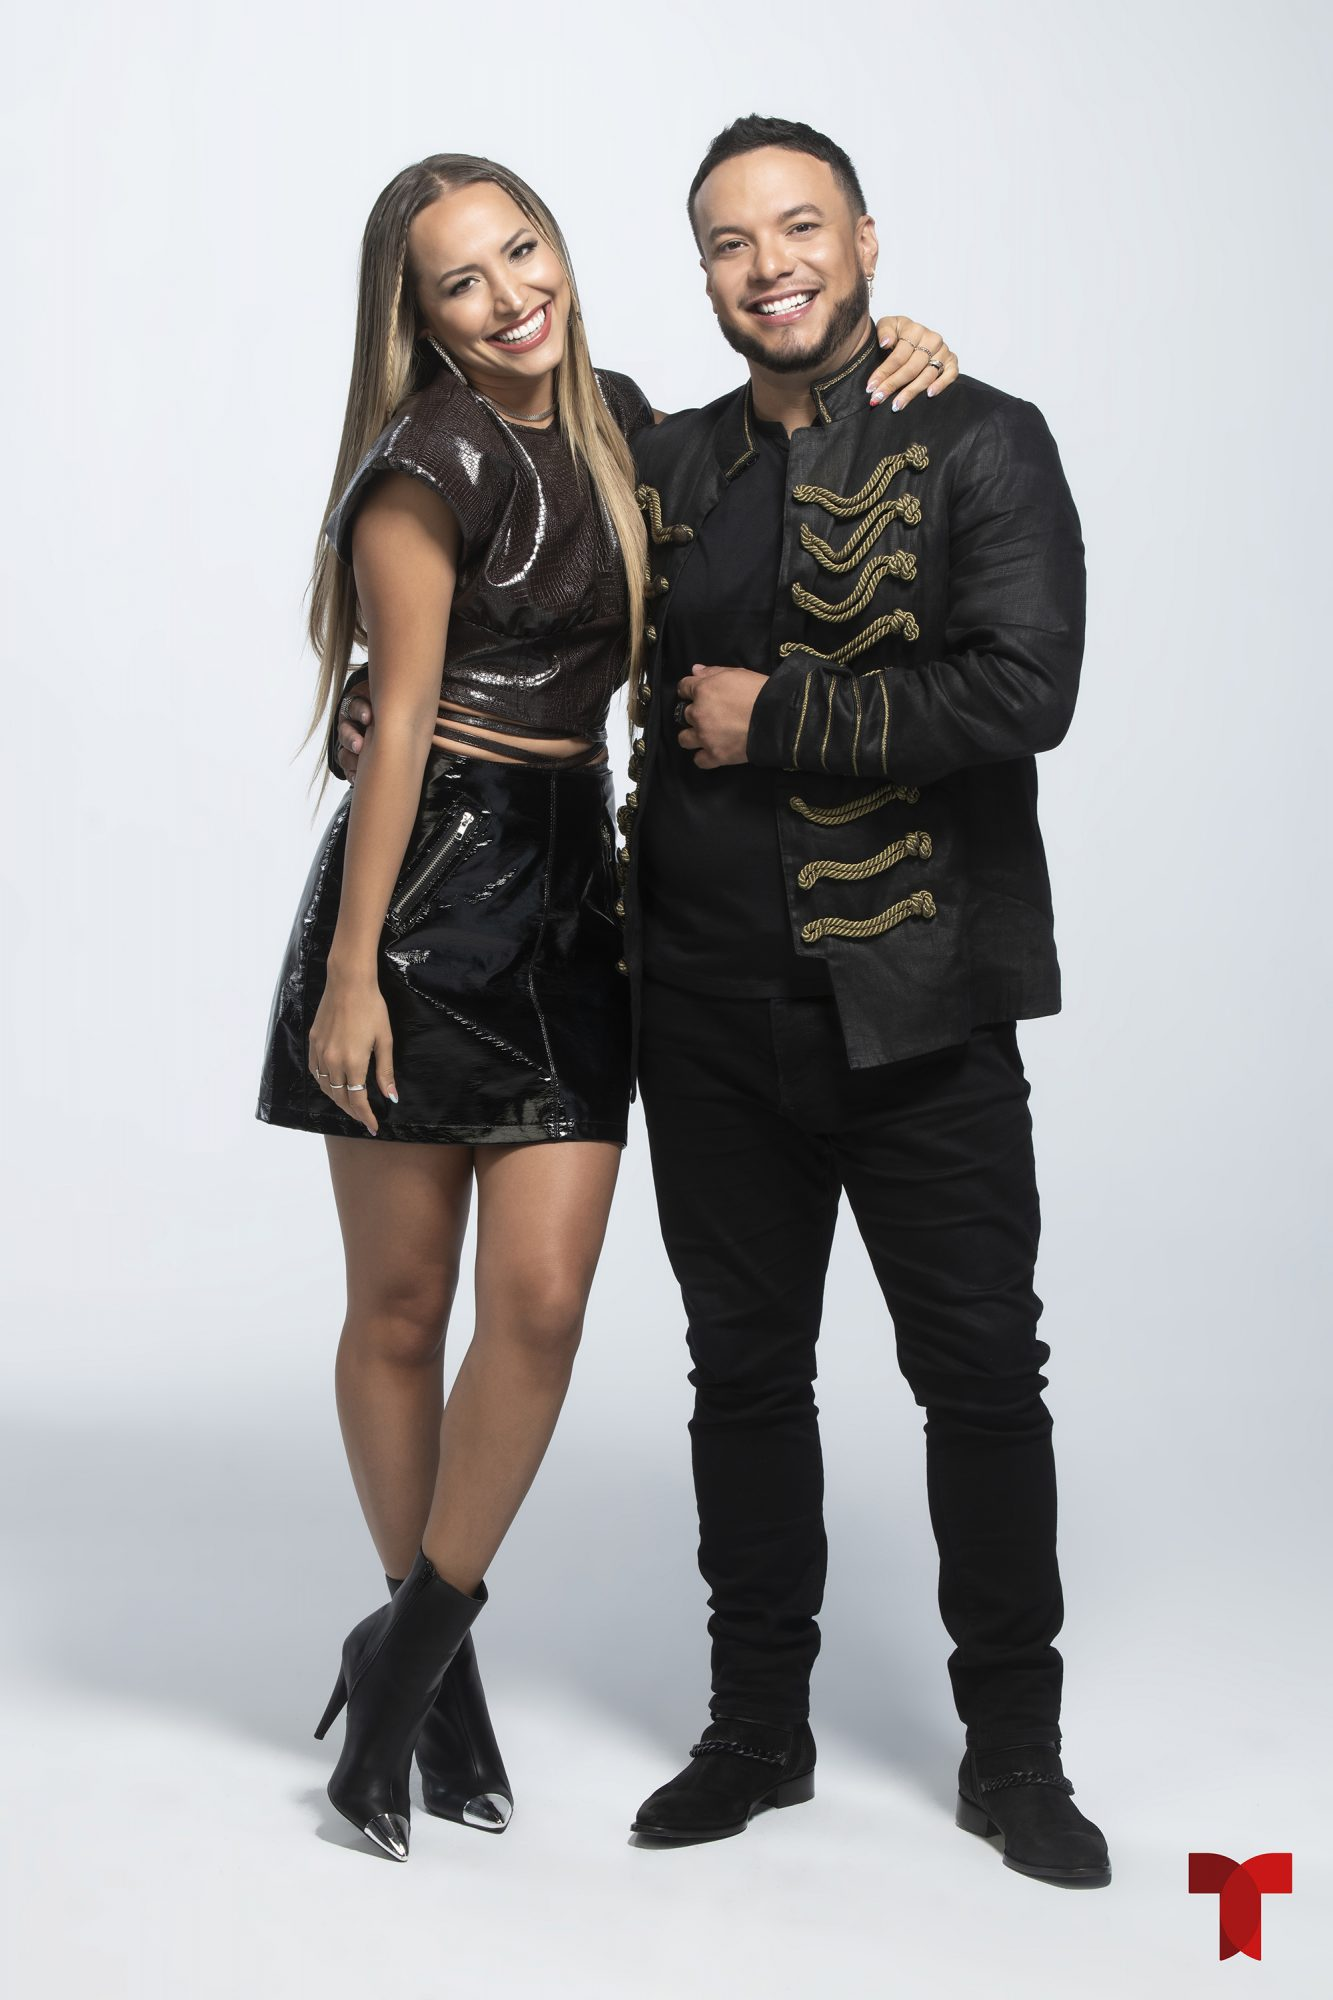 Jessica Diaz y Lorenzo Mendez